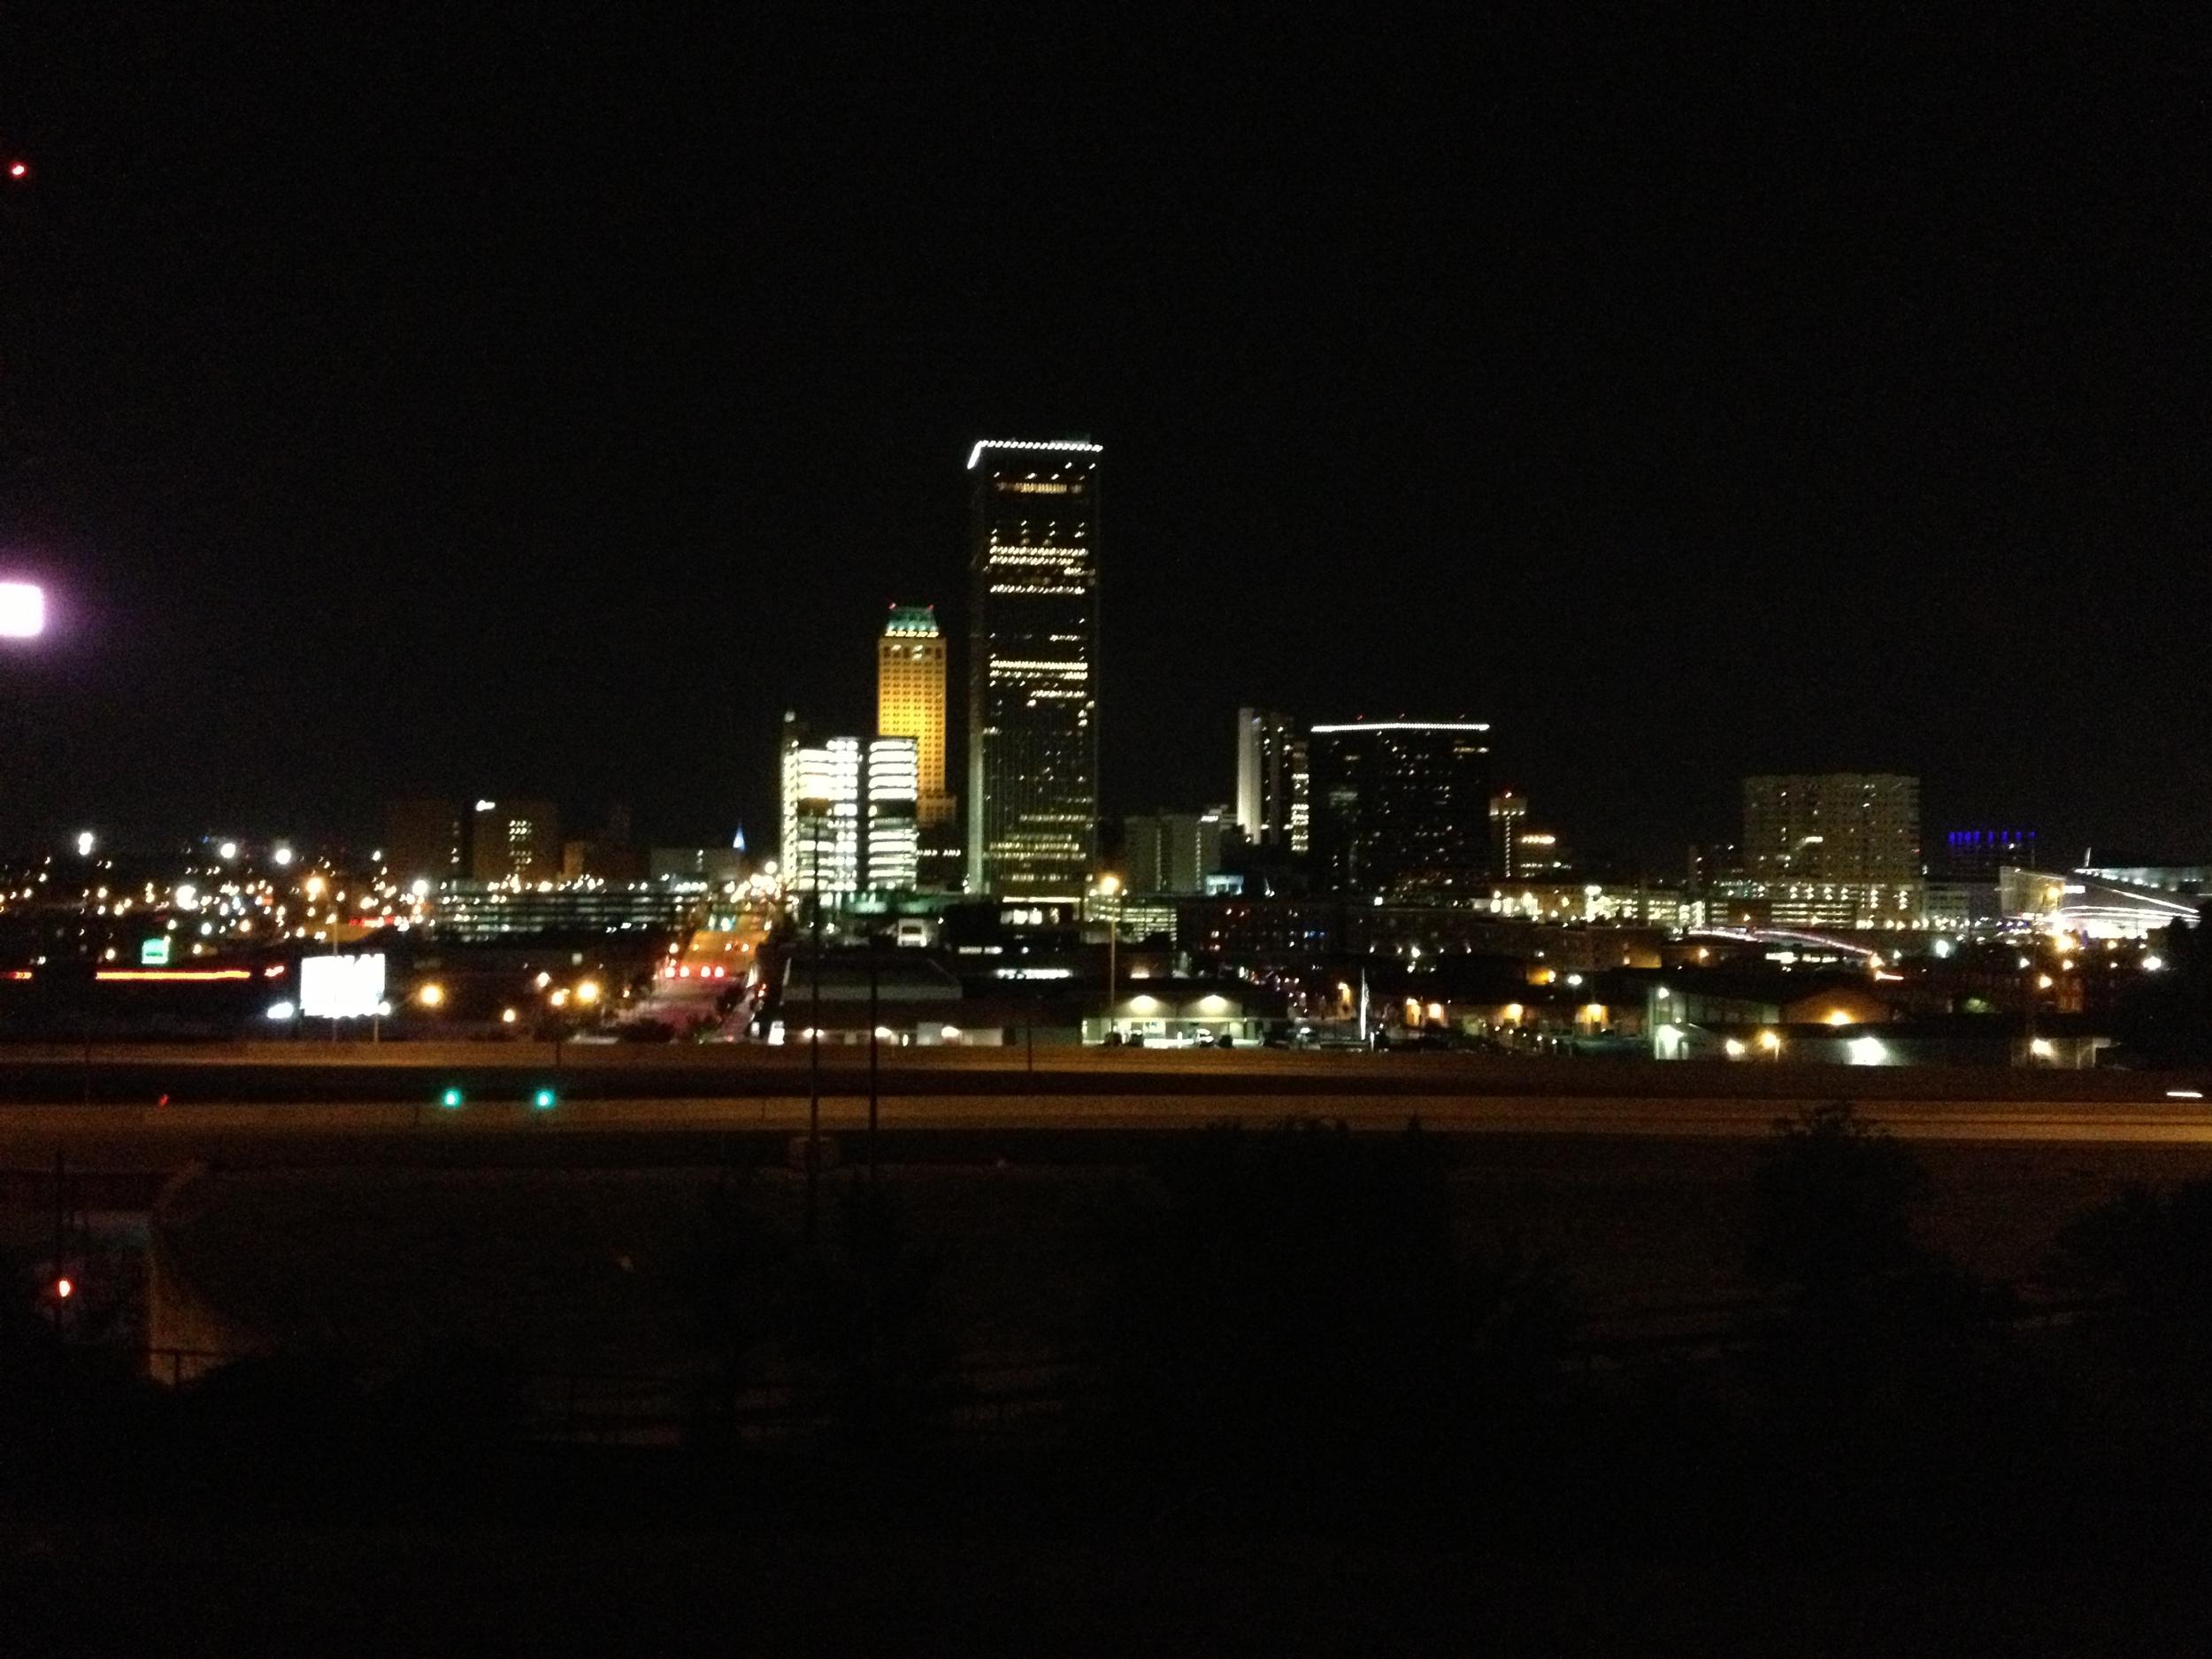 Tulsa, Oklahoma viewed at night